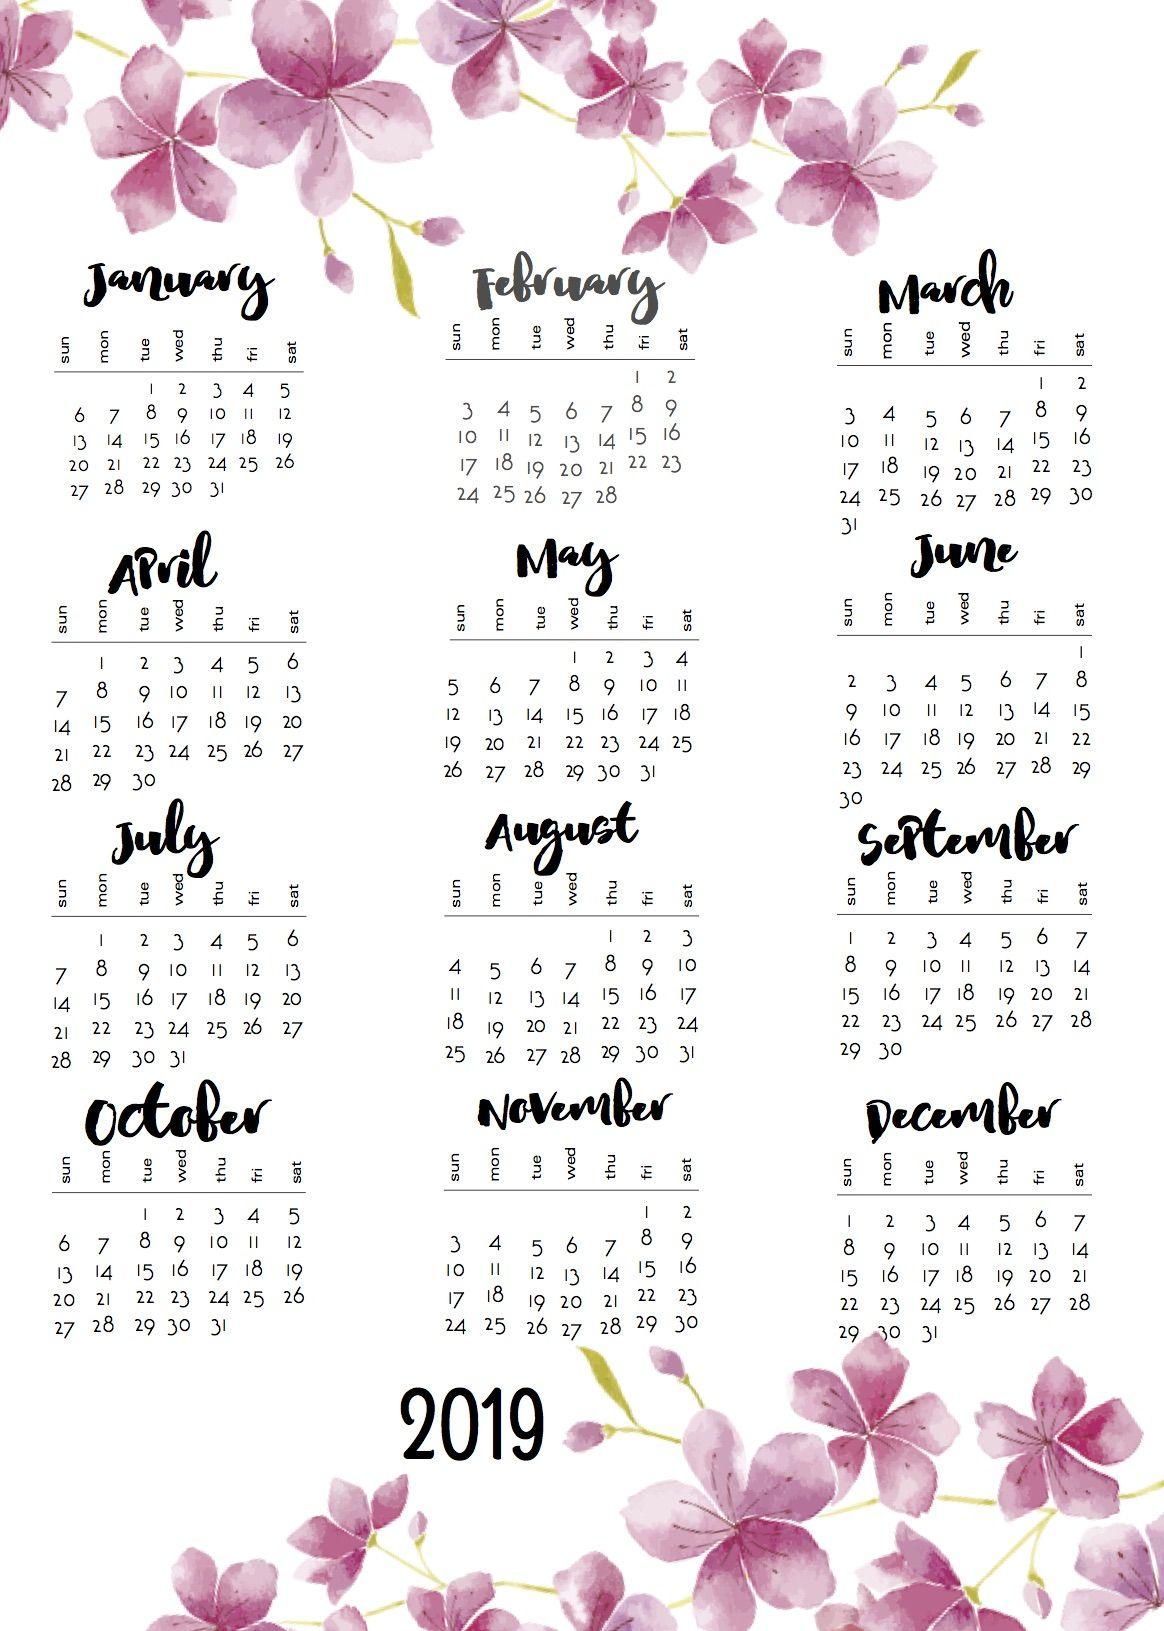 2019 Calendars | 2019 calendar, Calendar, Calendar journal